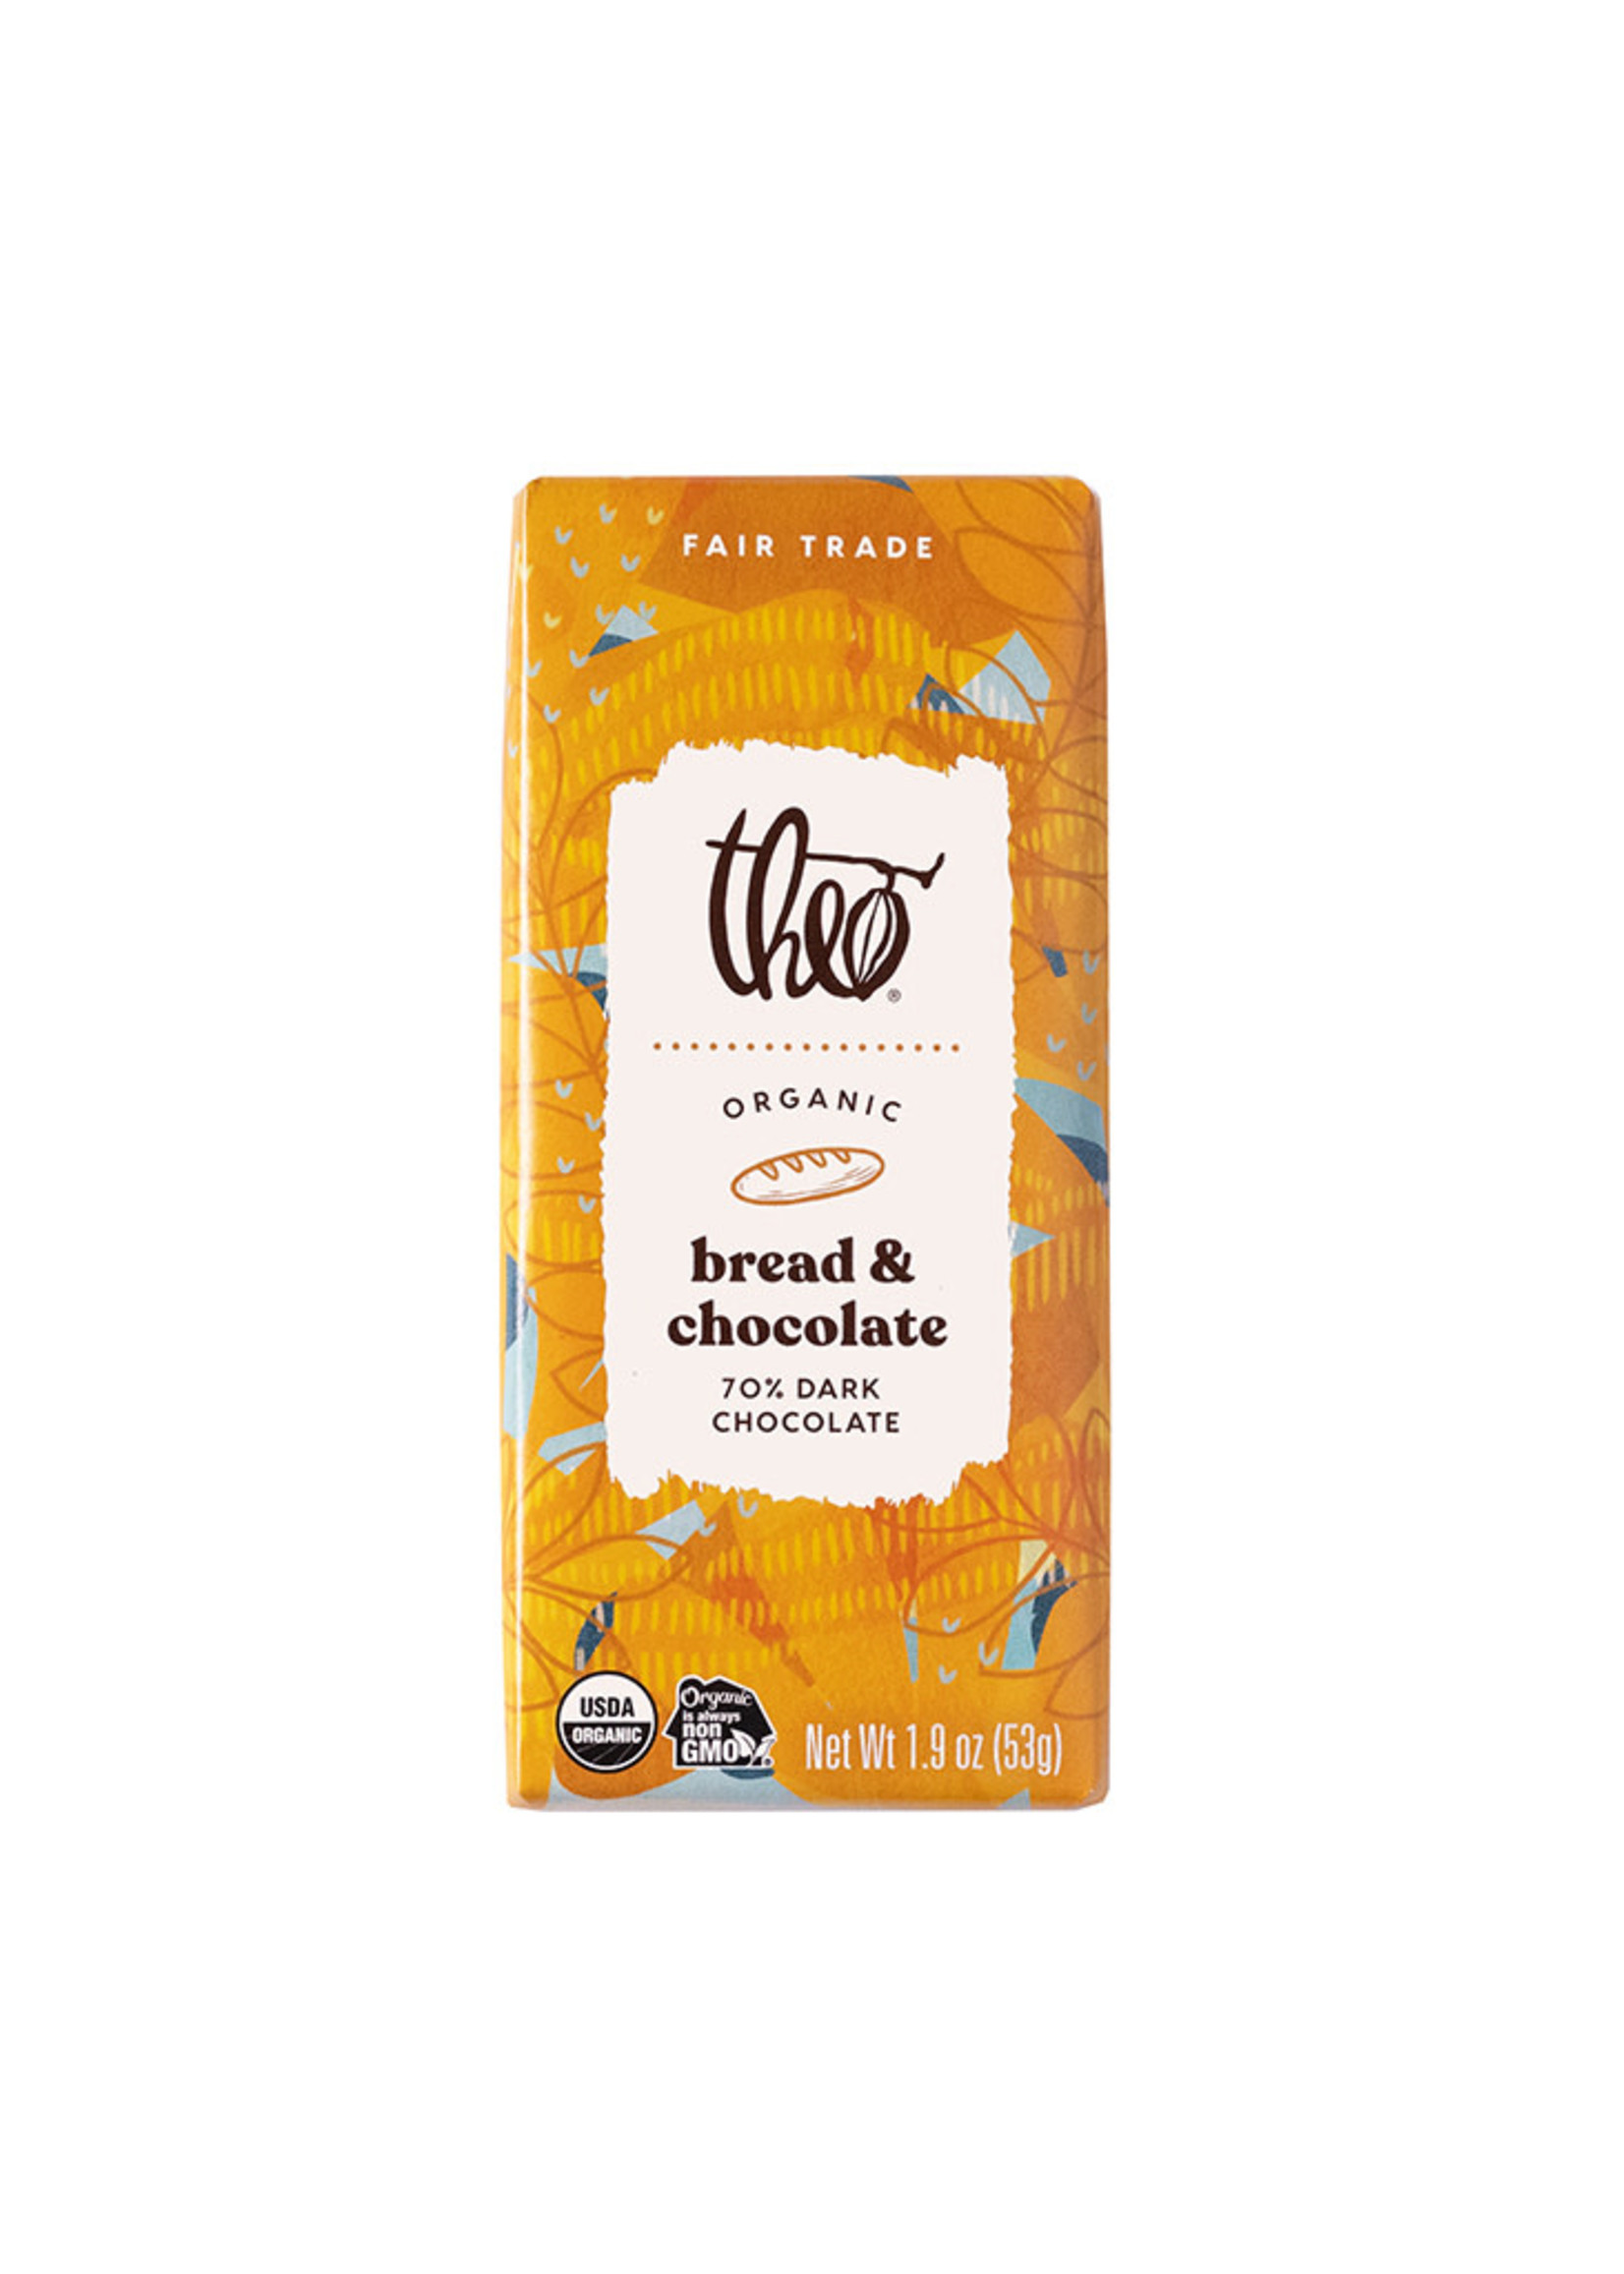 Theo Chocolate Bread & Chocolate Bar